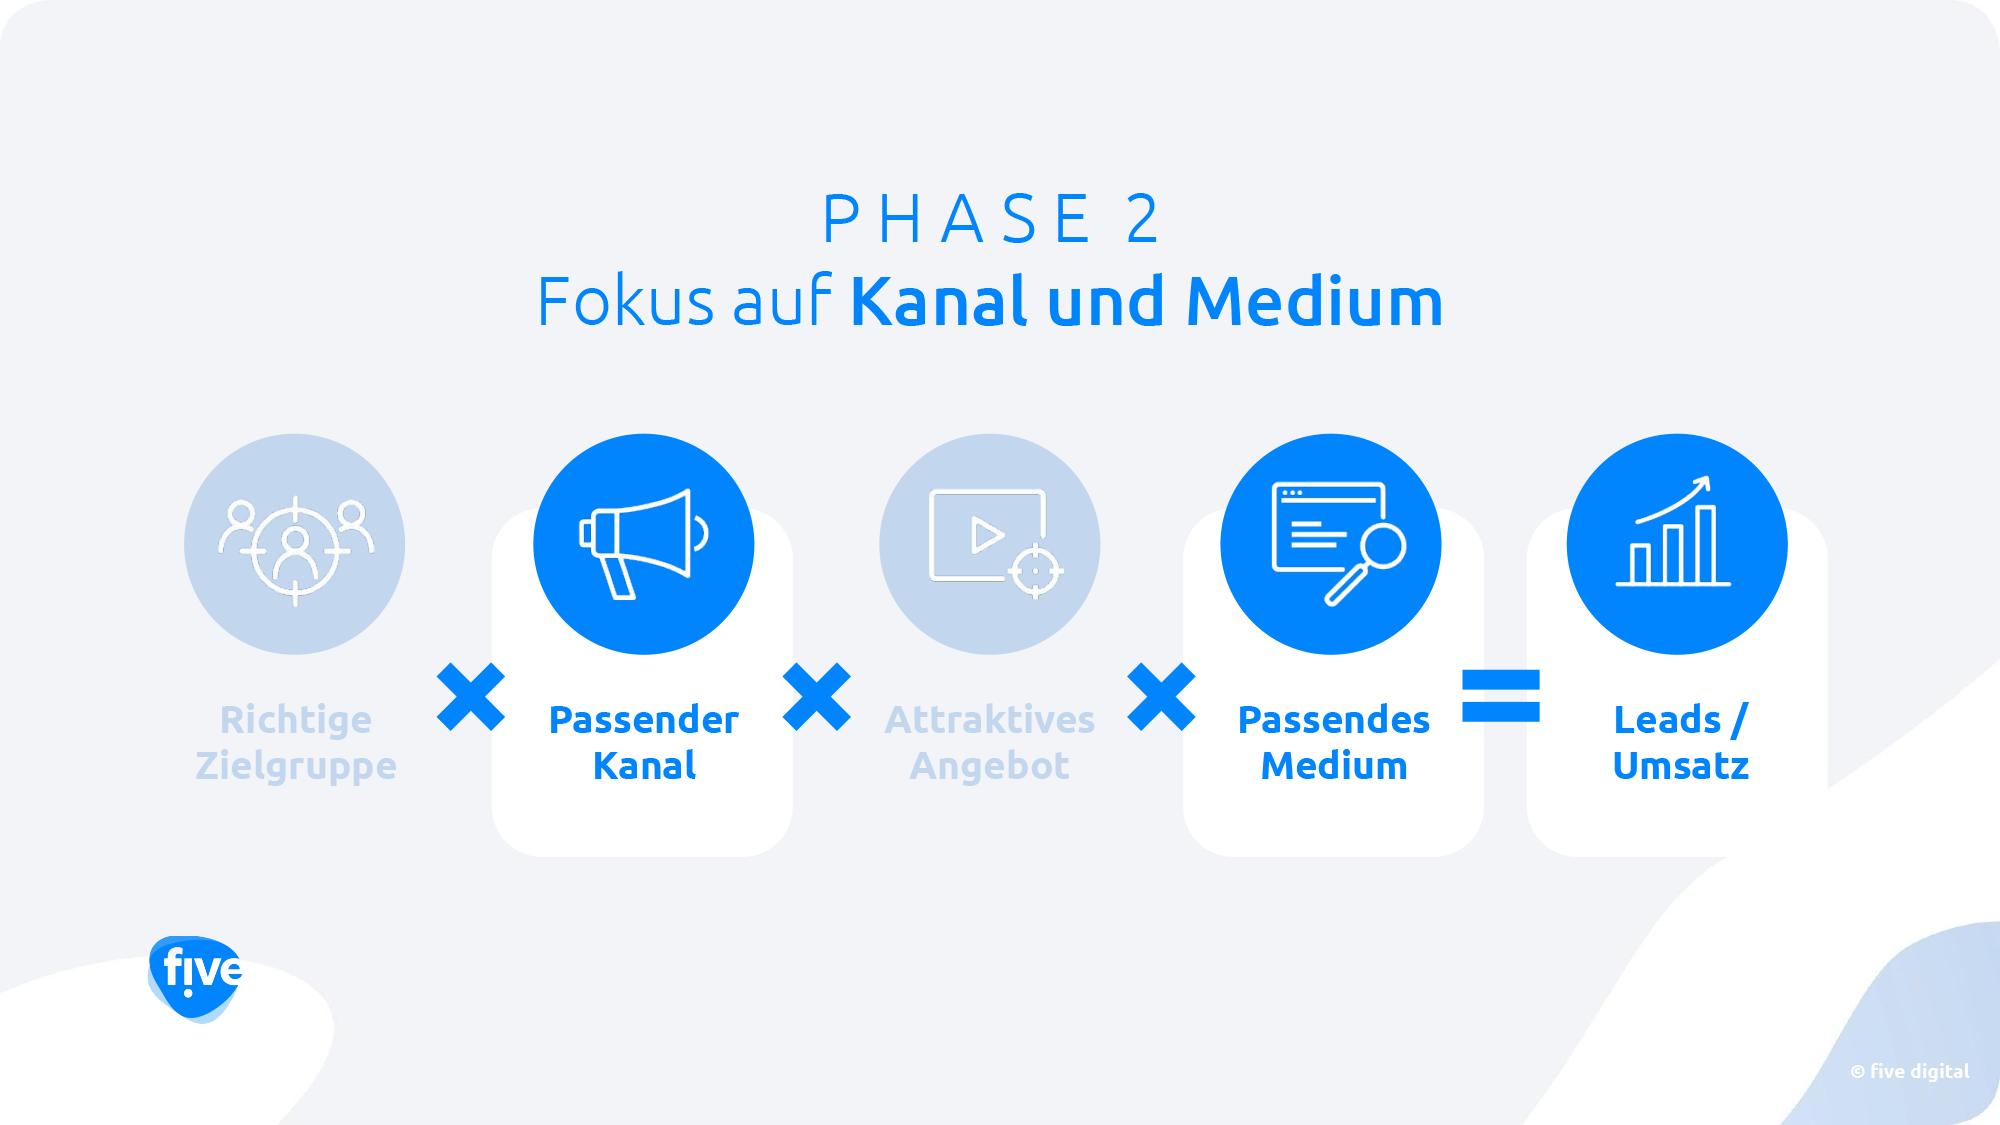 Leadgenerierung Formel - Phase 2_five digital